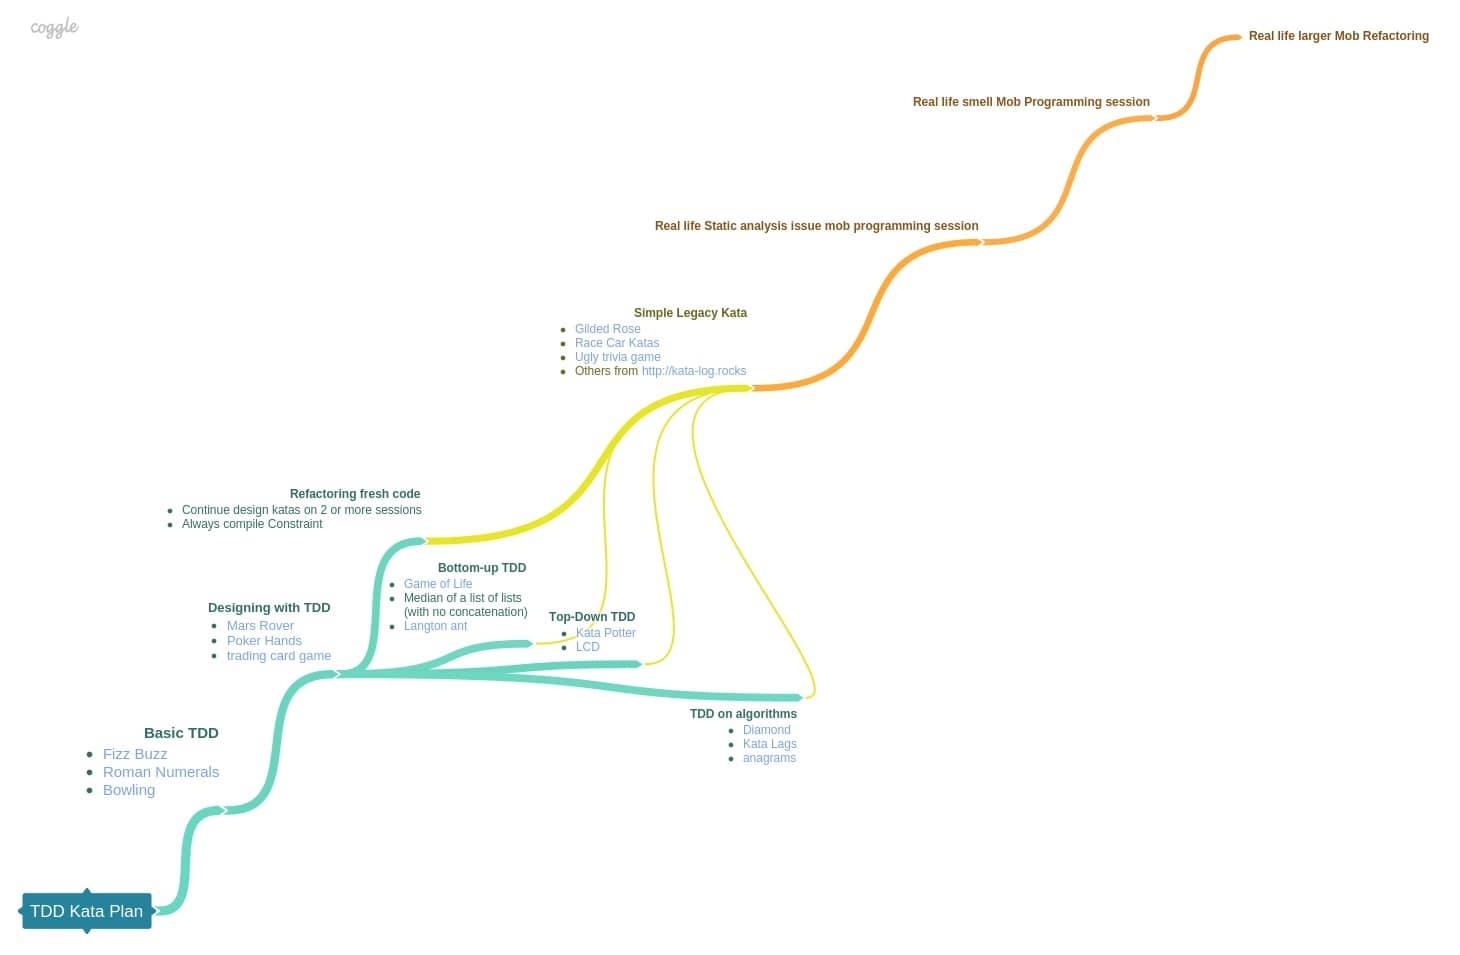 A coding dojo exercises plan towards refactoring legacy code